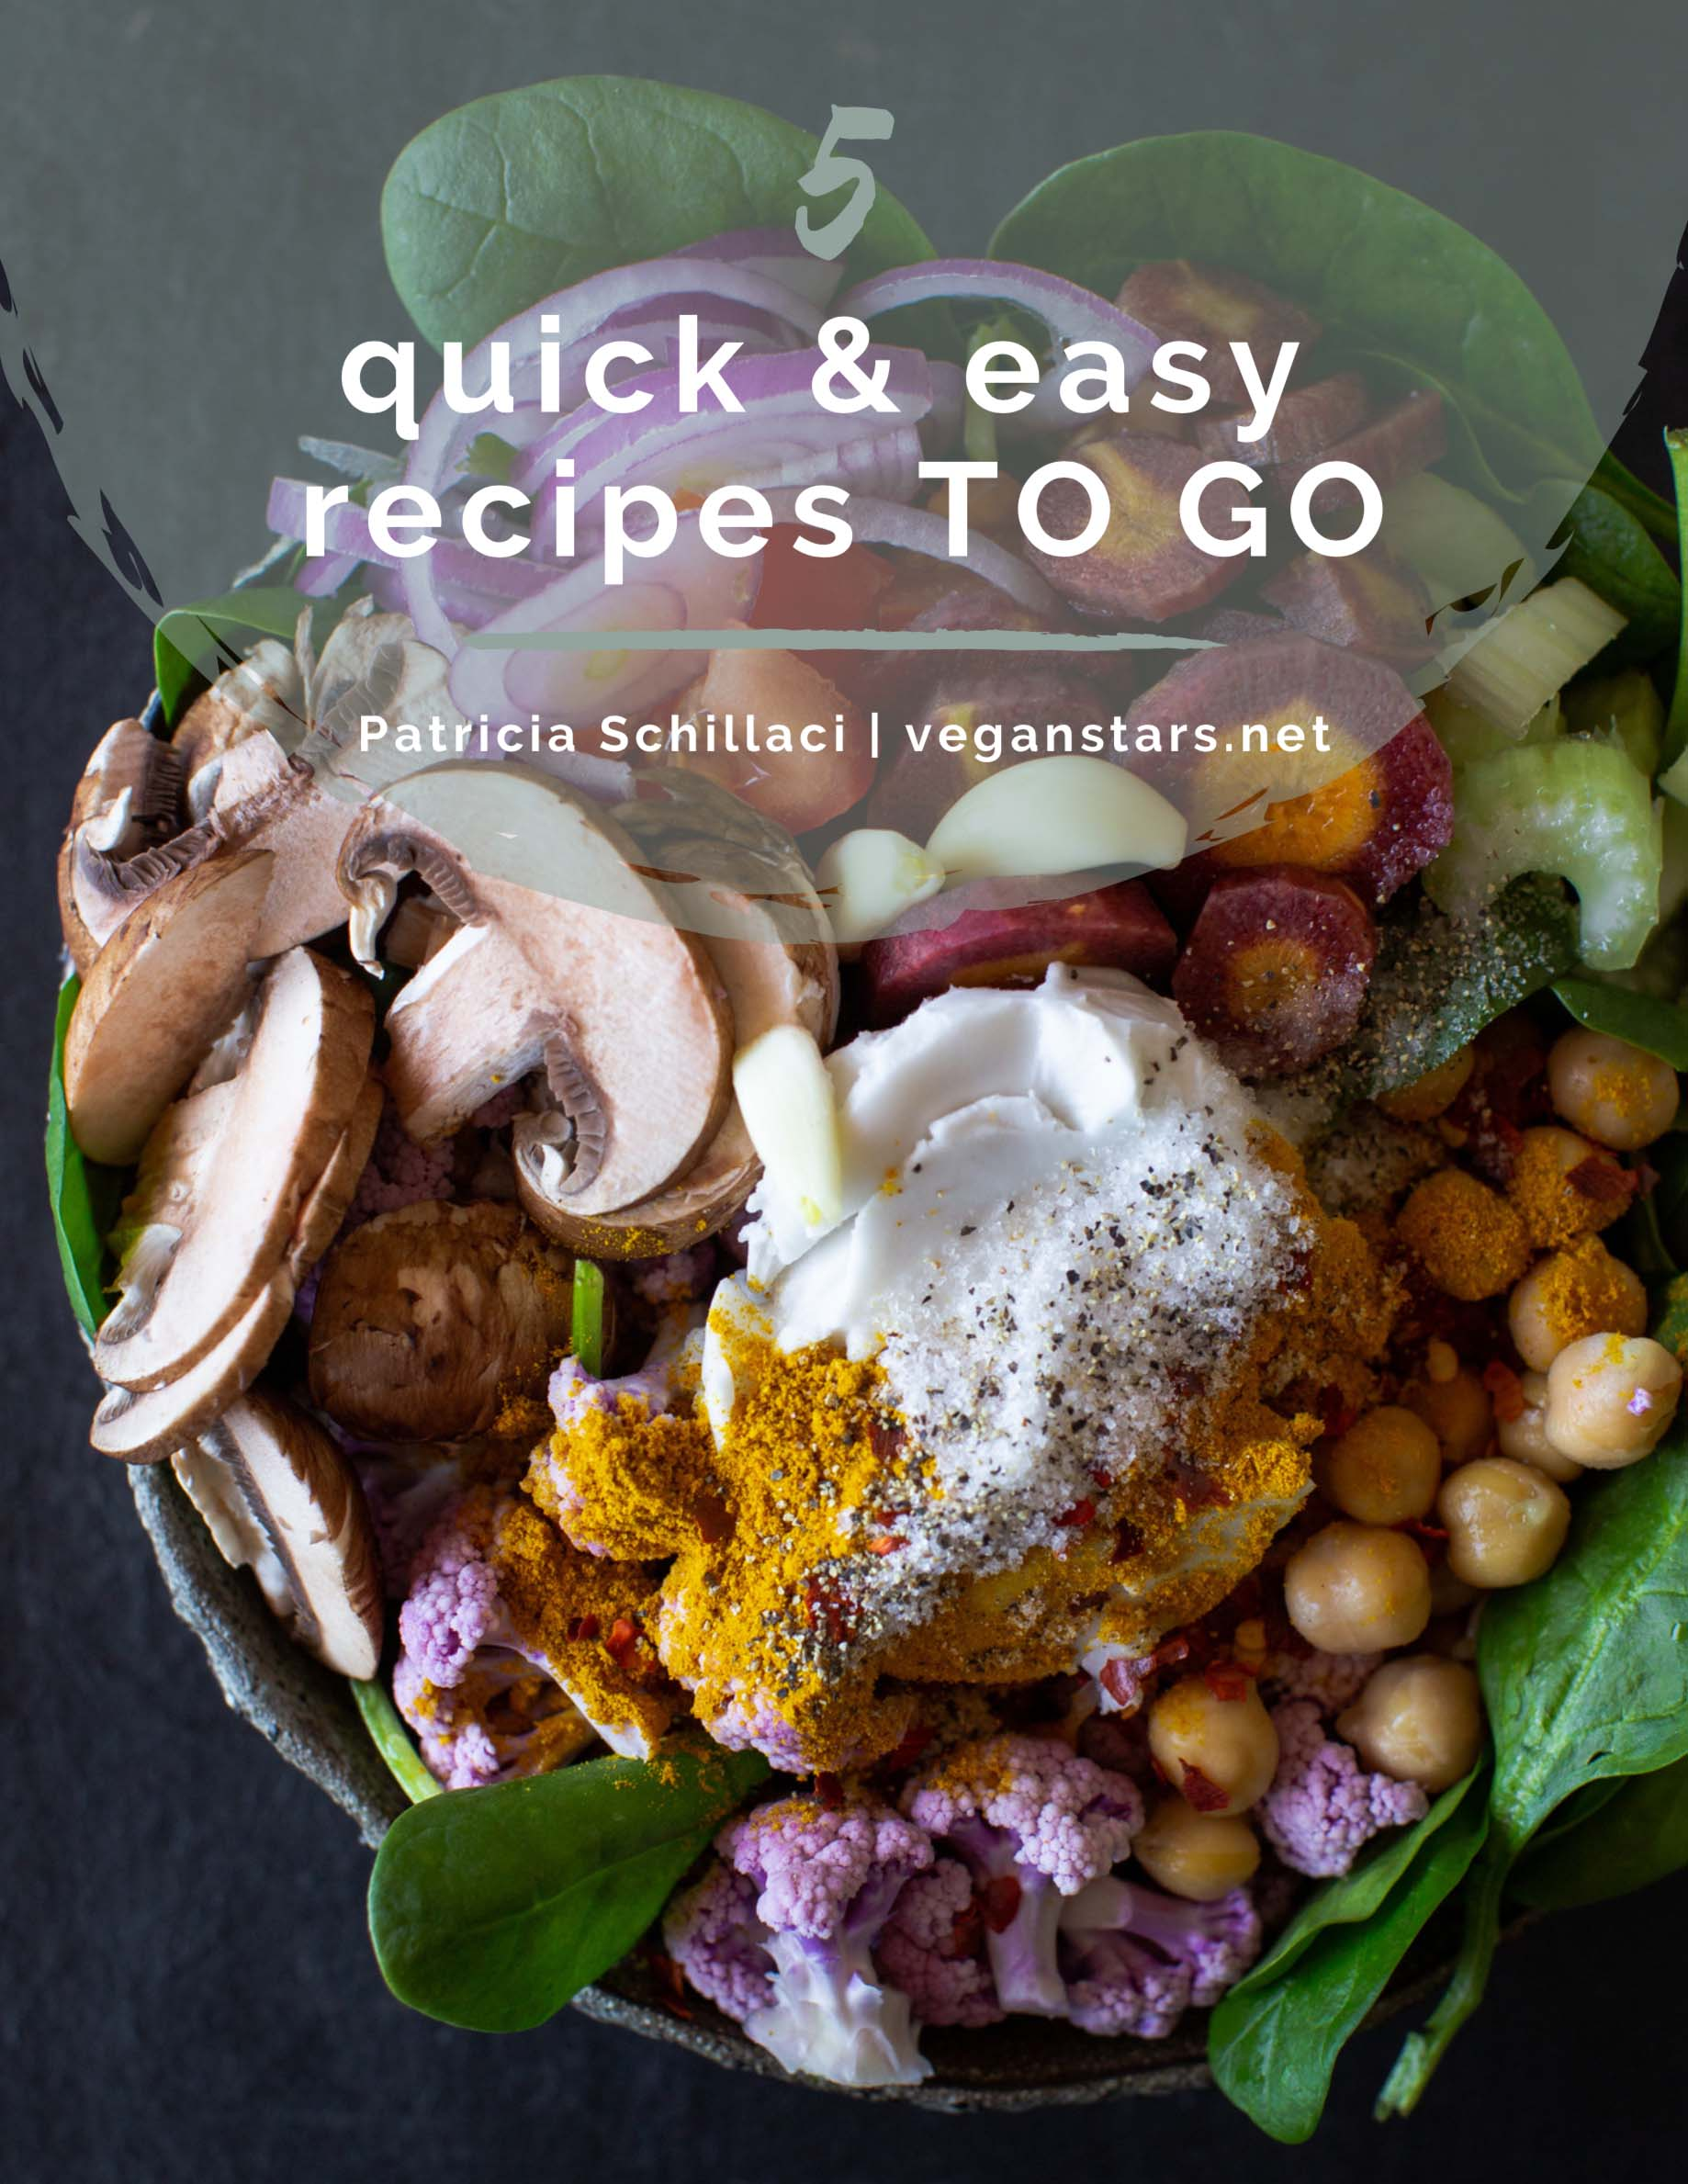 5 quick & easy recipes TO GO